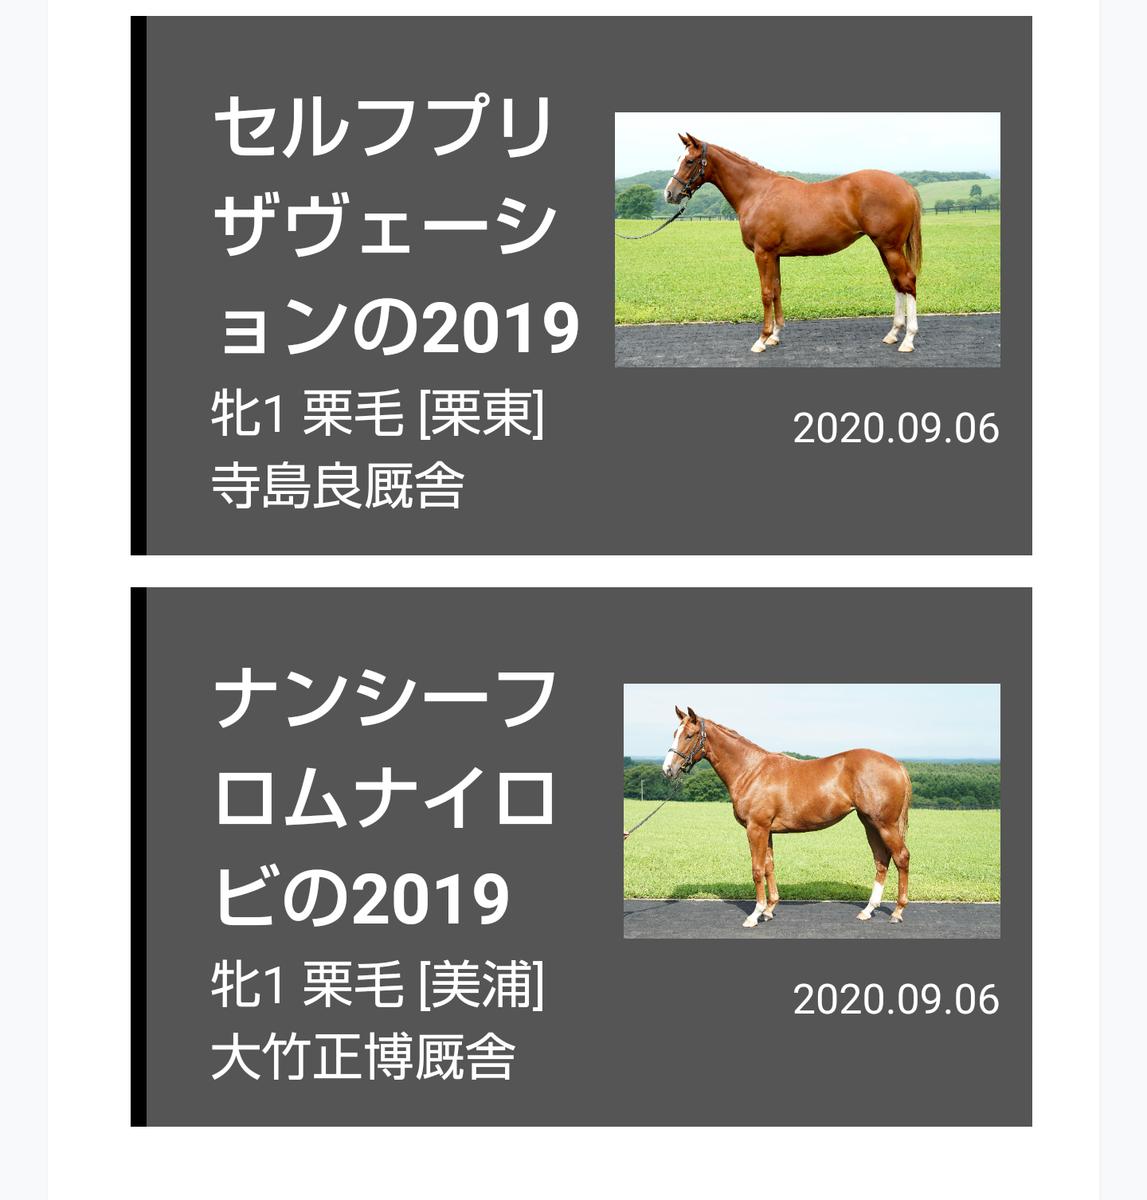 f:id:kurokiri-G1:20200914014206p:plain